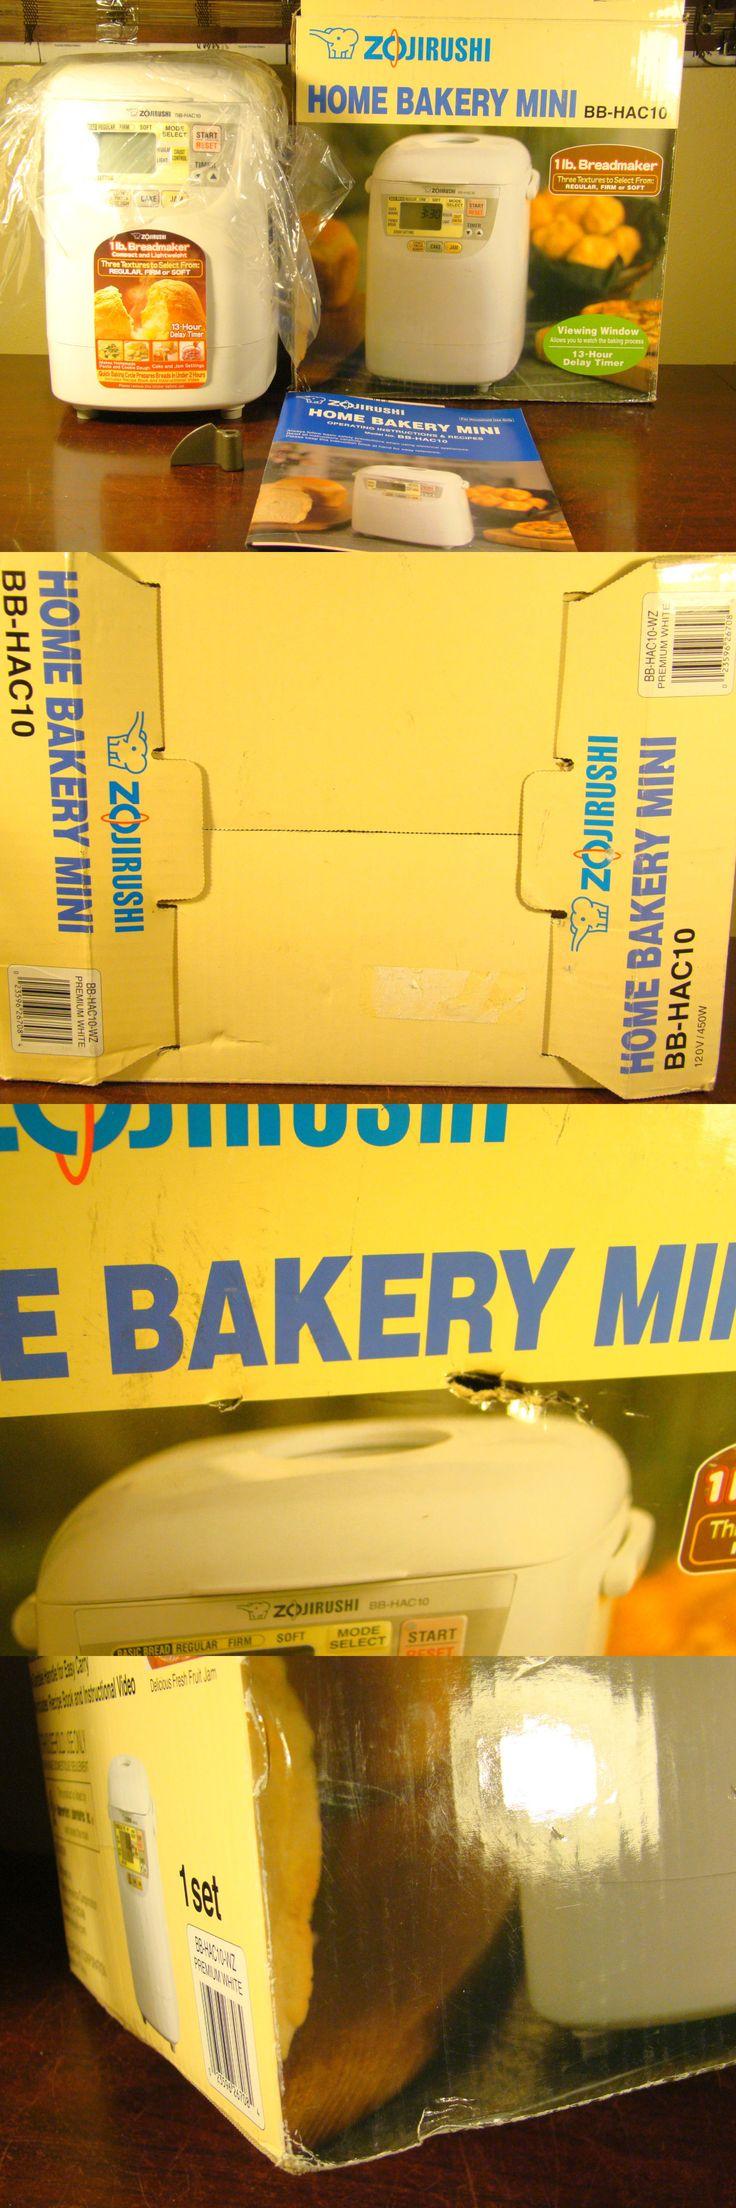 Bread Machines 20669: Zojirushi Bb-Hac10 Home Bakery Mini 1Lb. Breadmaker Bbhac10 *New Open-Box* -> BUY IT NOW ONLY: $174.99 on eBay!